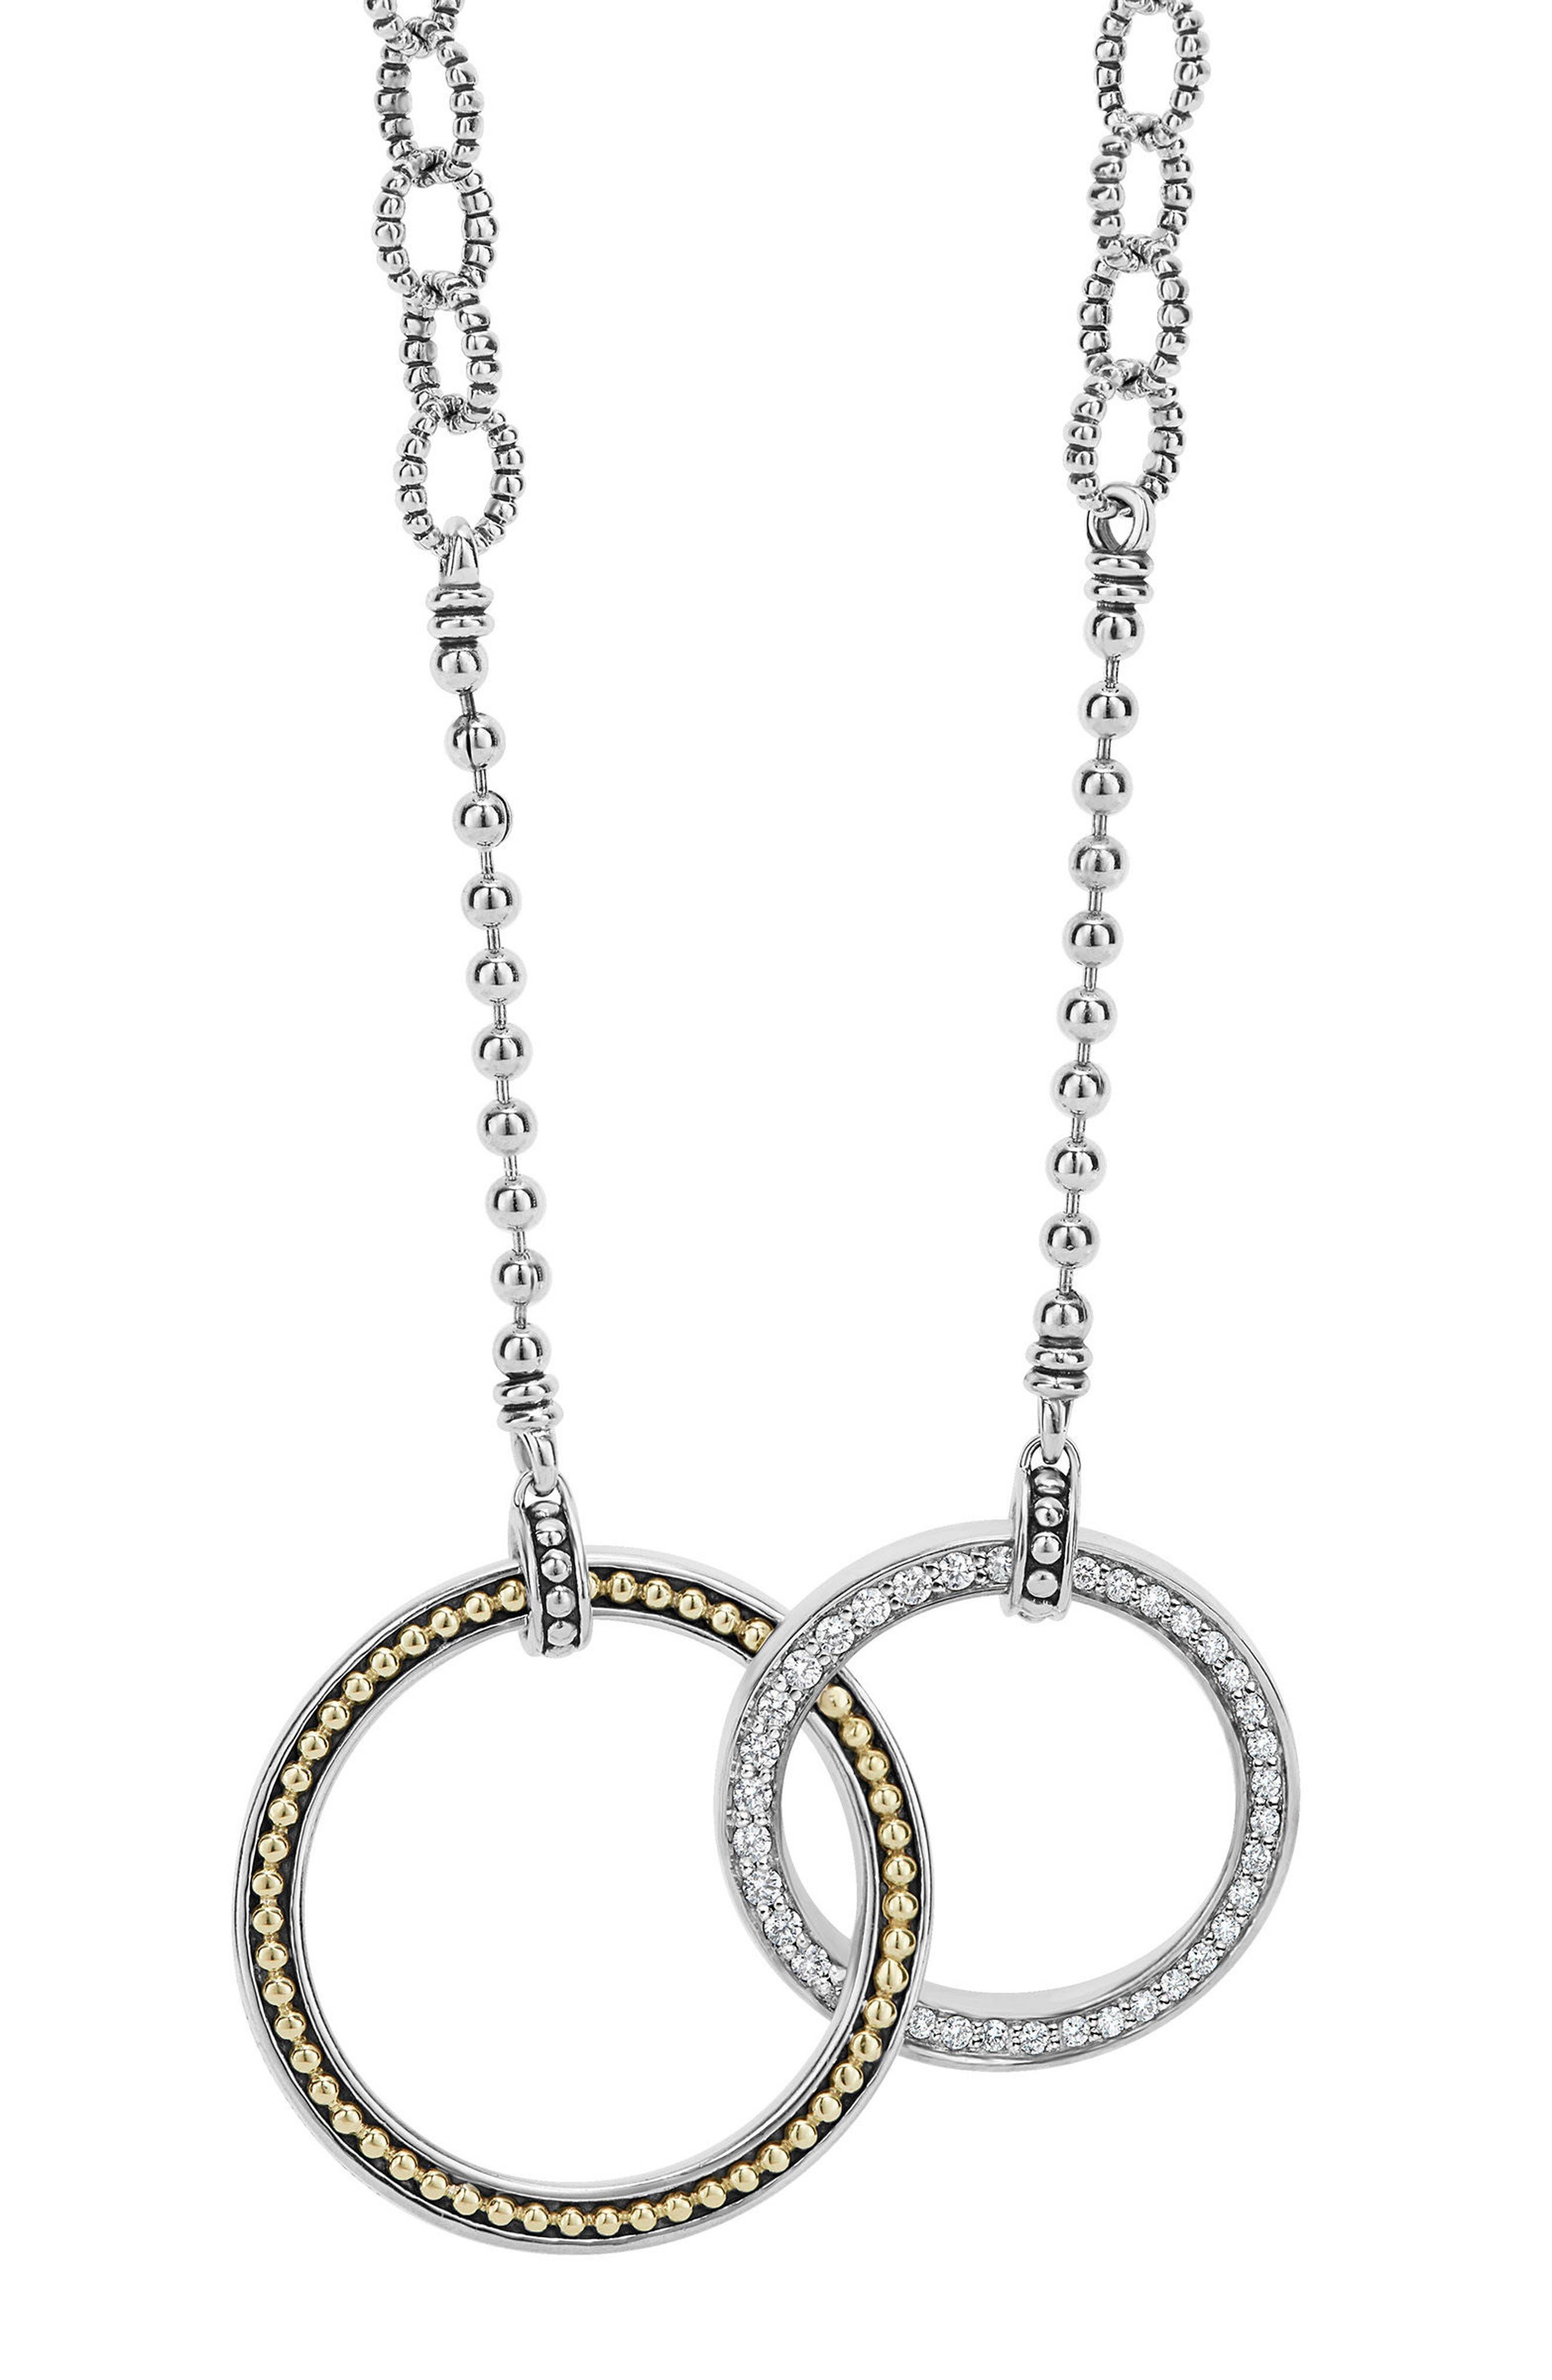 Enso Diamond Pendant Necklace,                             Main thumbnail 1, color,                             SILVER